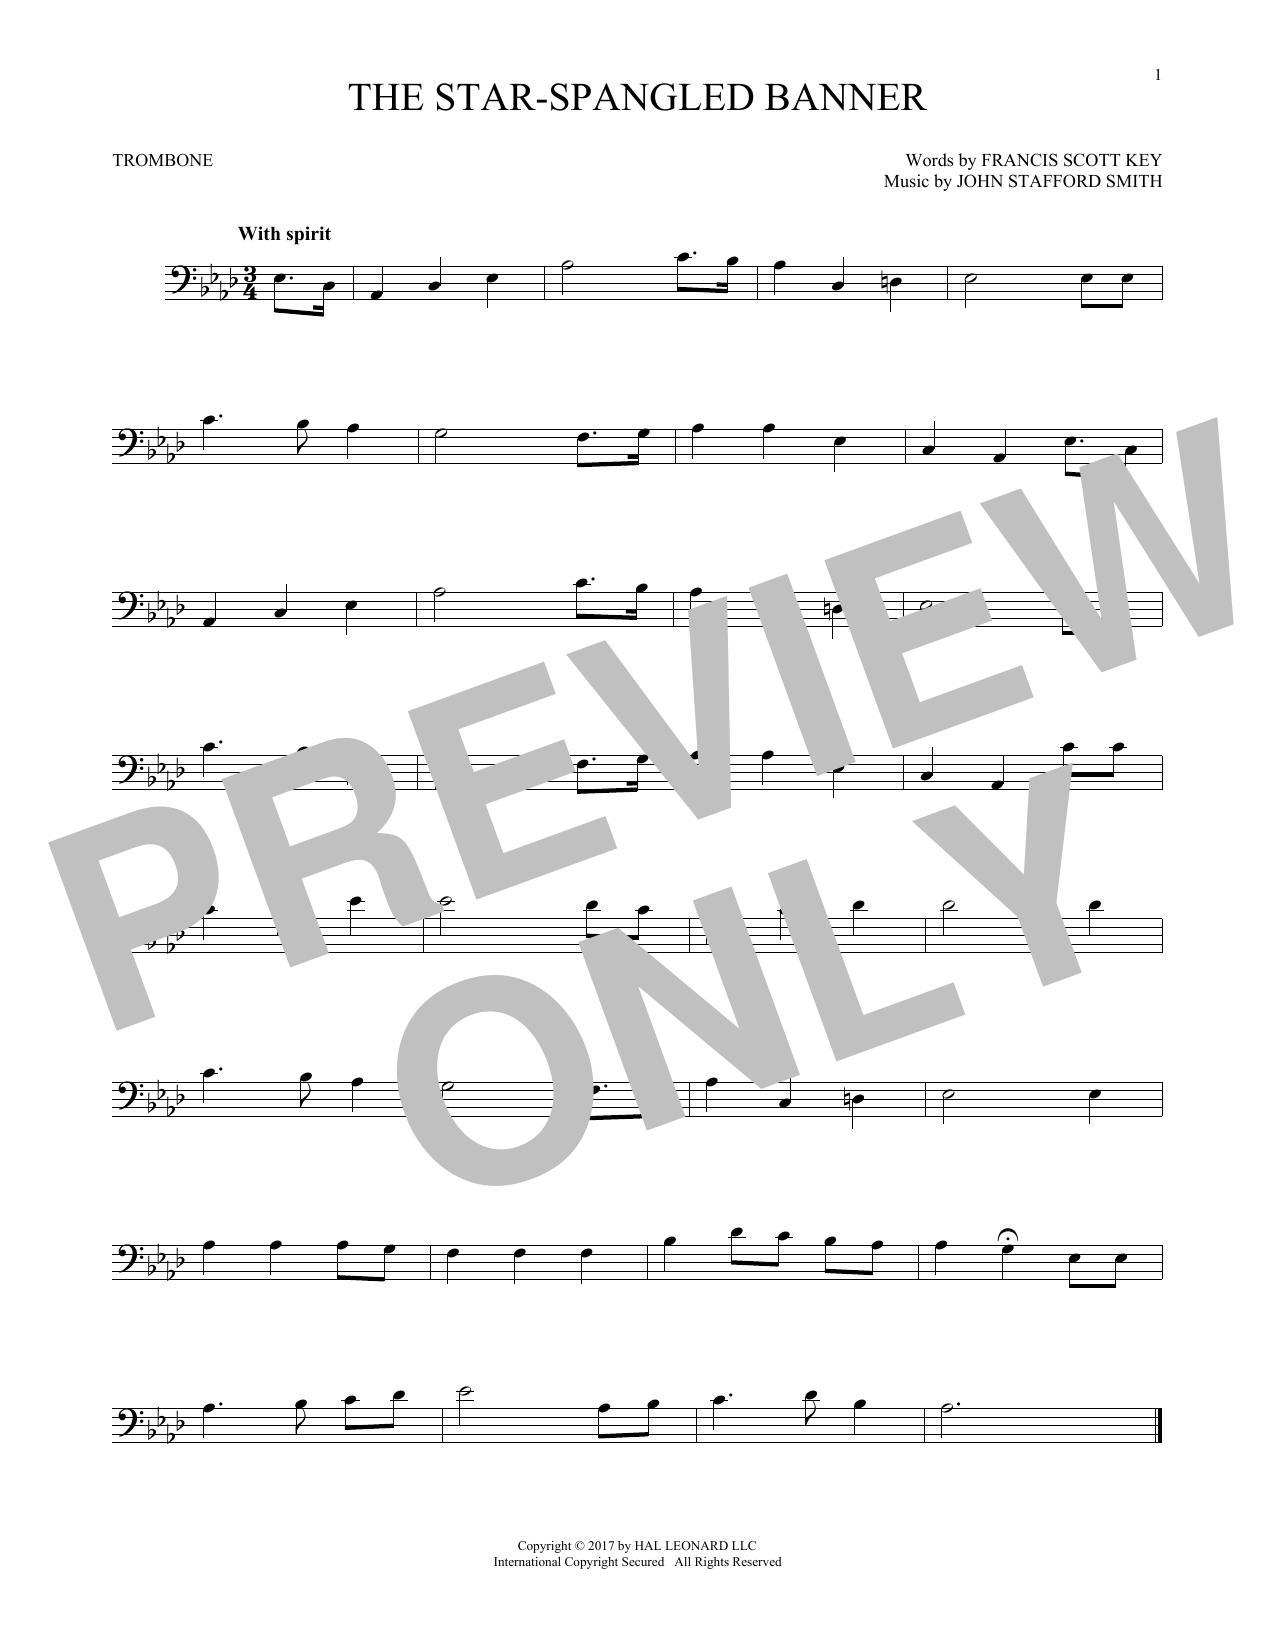 The Star-Spangled Banner (Trombone Solo)